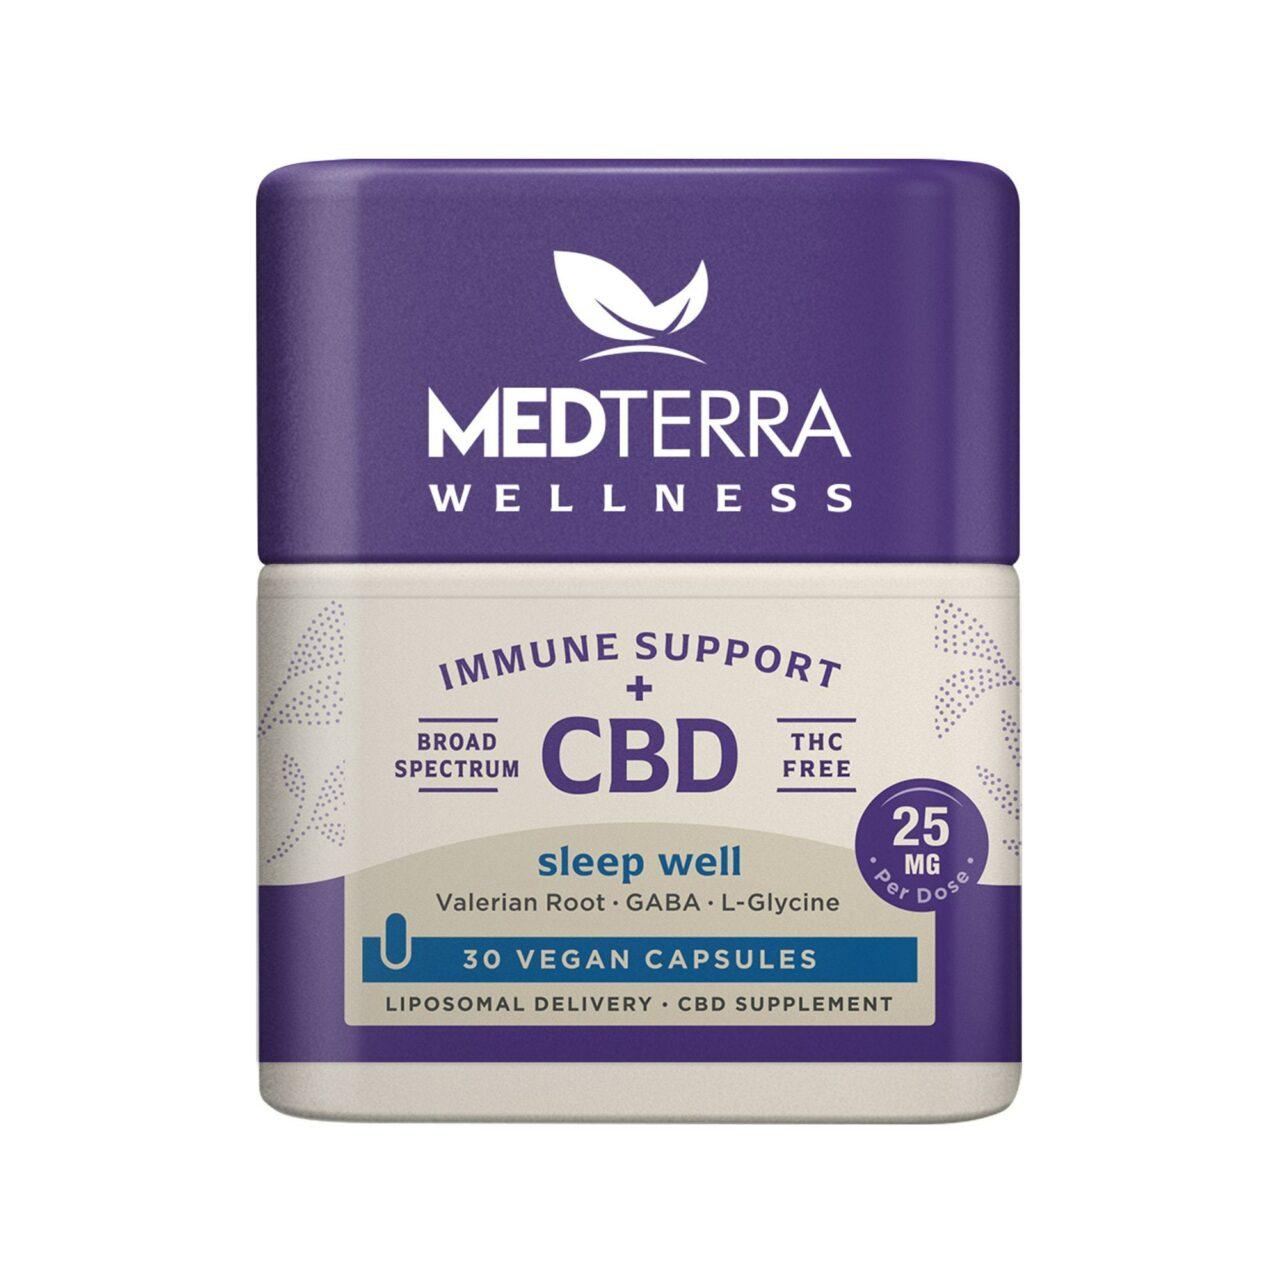 Medterra, Wellness CBD Capsules, Sleep Well, Broad Spectrum THC-Free, 30ct, 750mg CBD 1